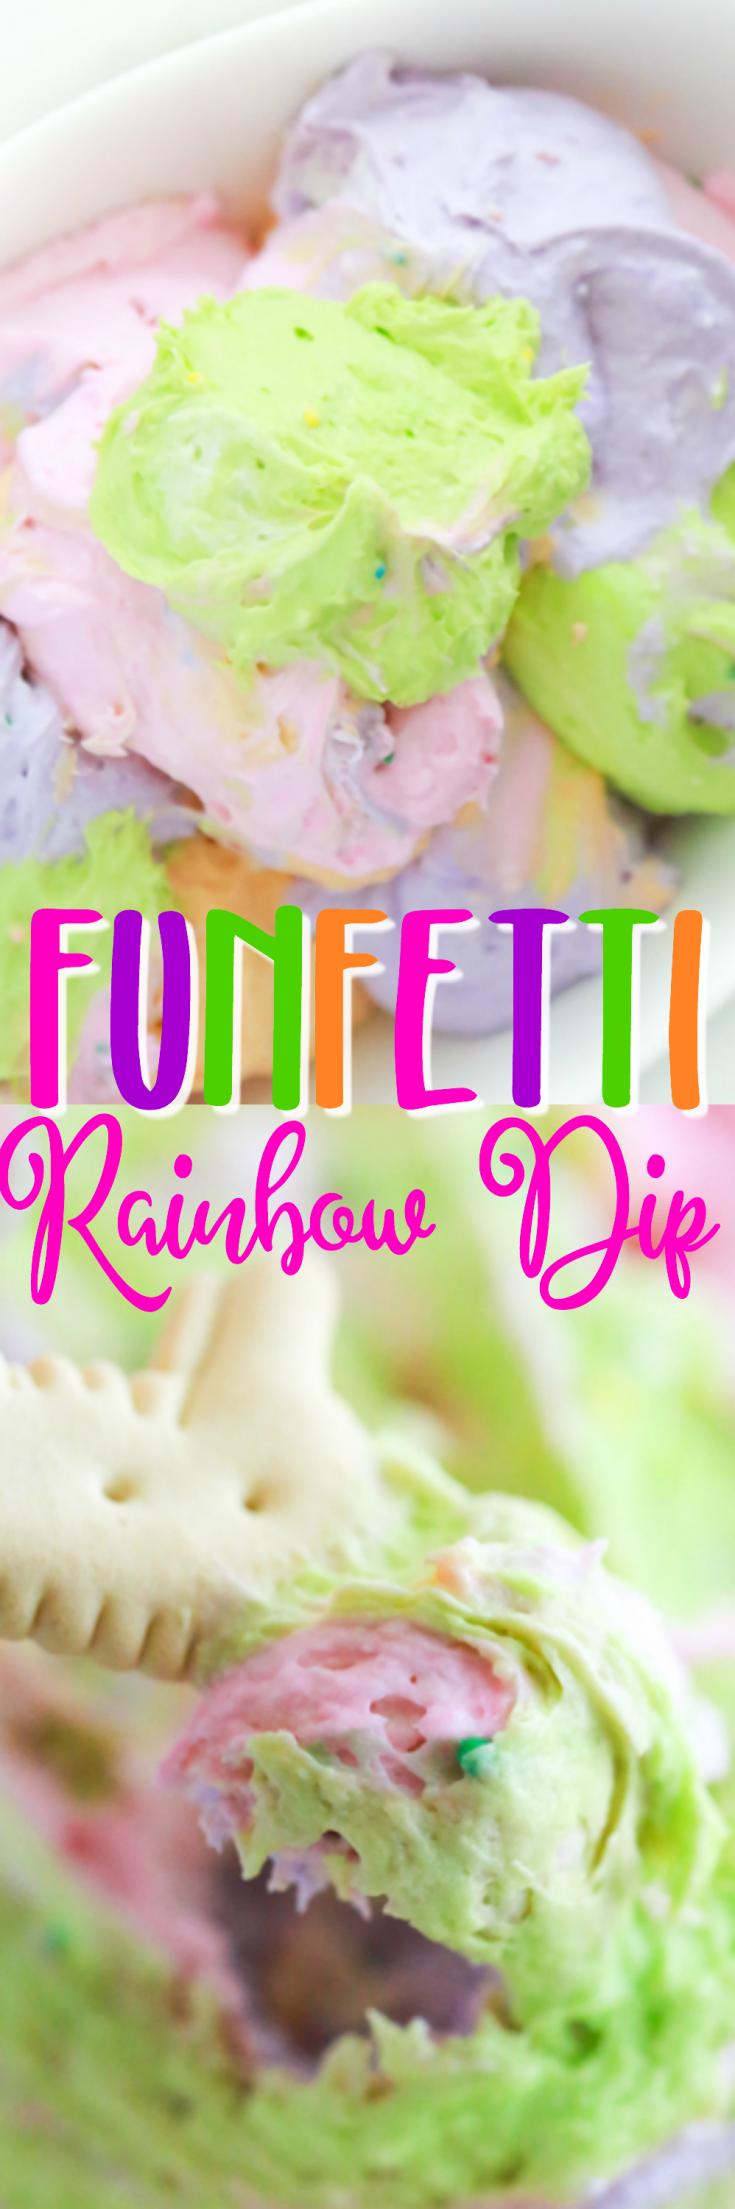 If you love Funfetti, you'll love this Funfetti Rainbow Dip perfect for St. Patrick's Day. #StPatricksDay #StPattysDay #Dip #RainbowDip